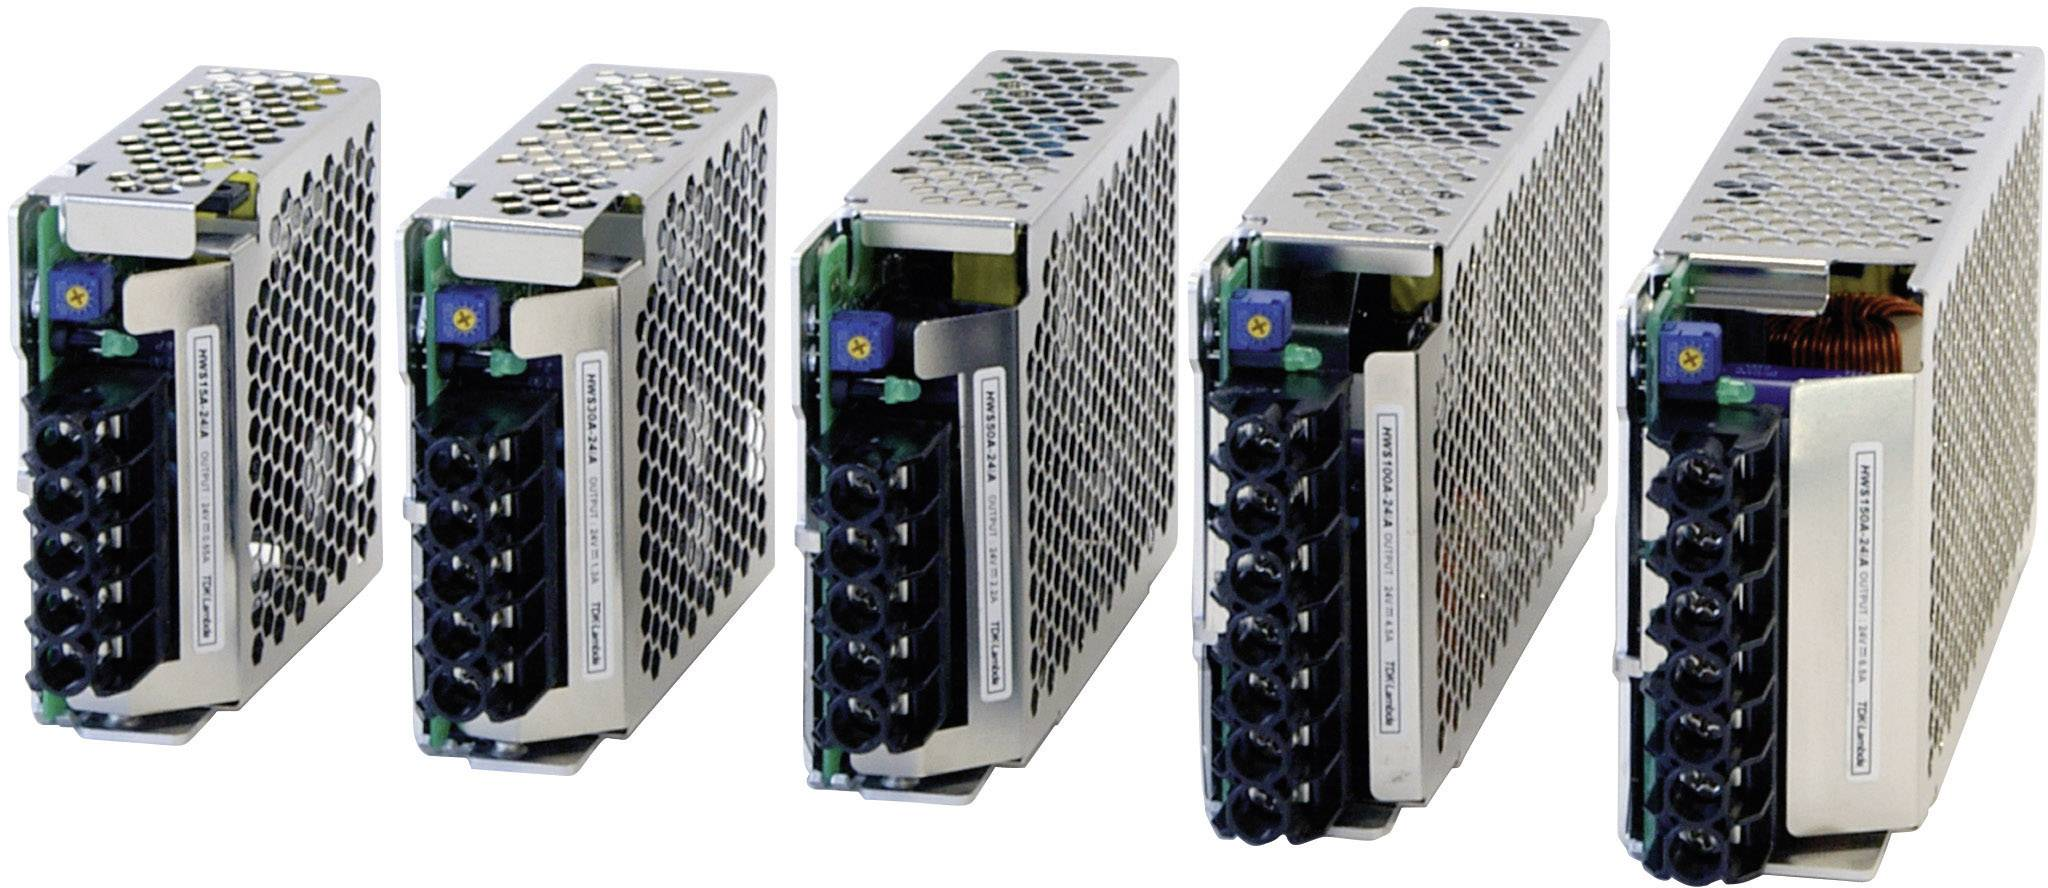 Zabudovateľný napájací zdroj TDK-Lambda HWS-100A-15/A, 15 V, 105 W